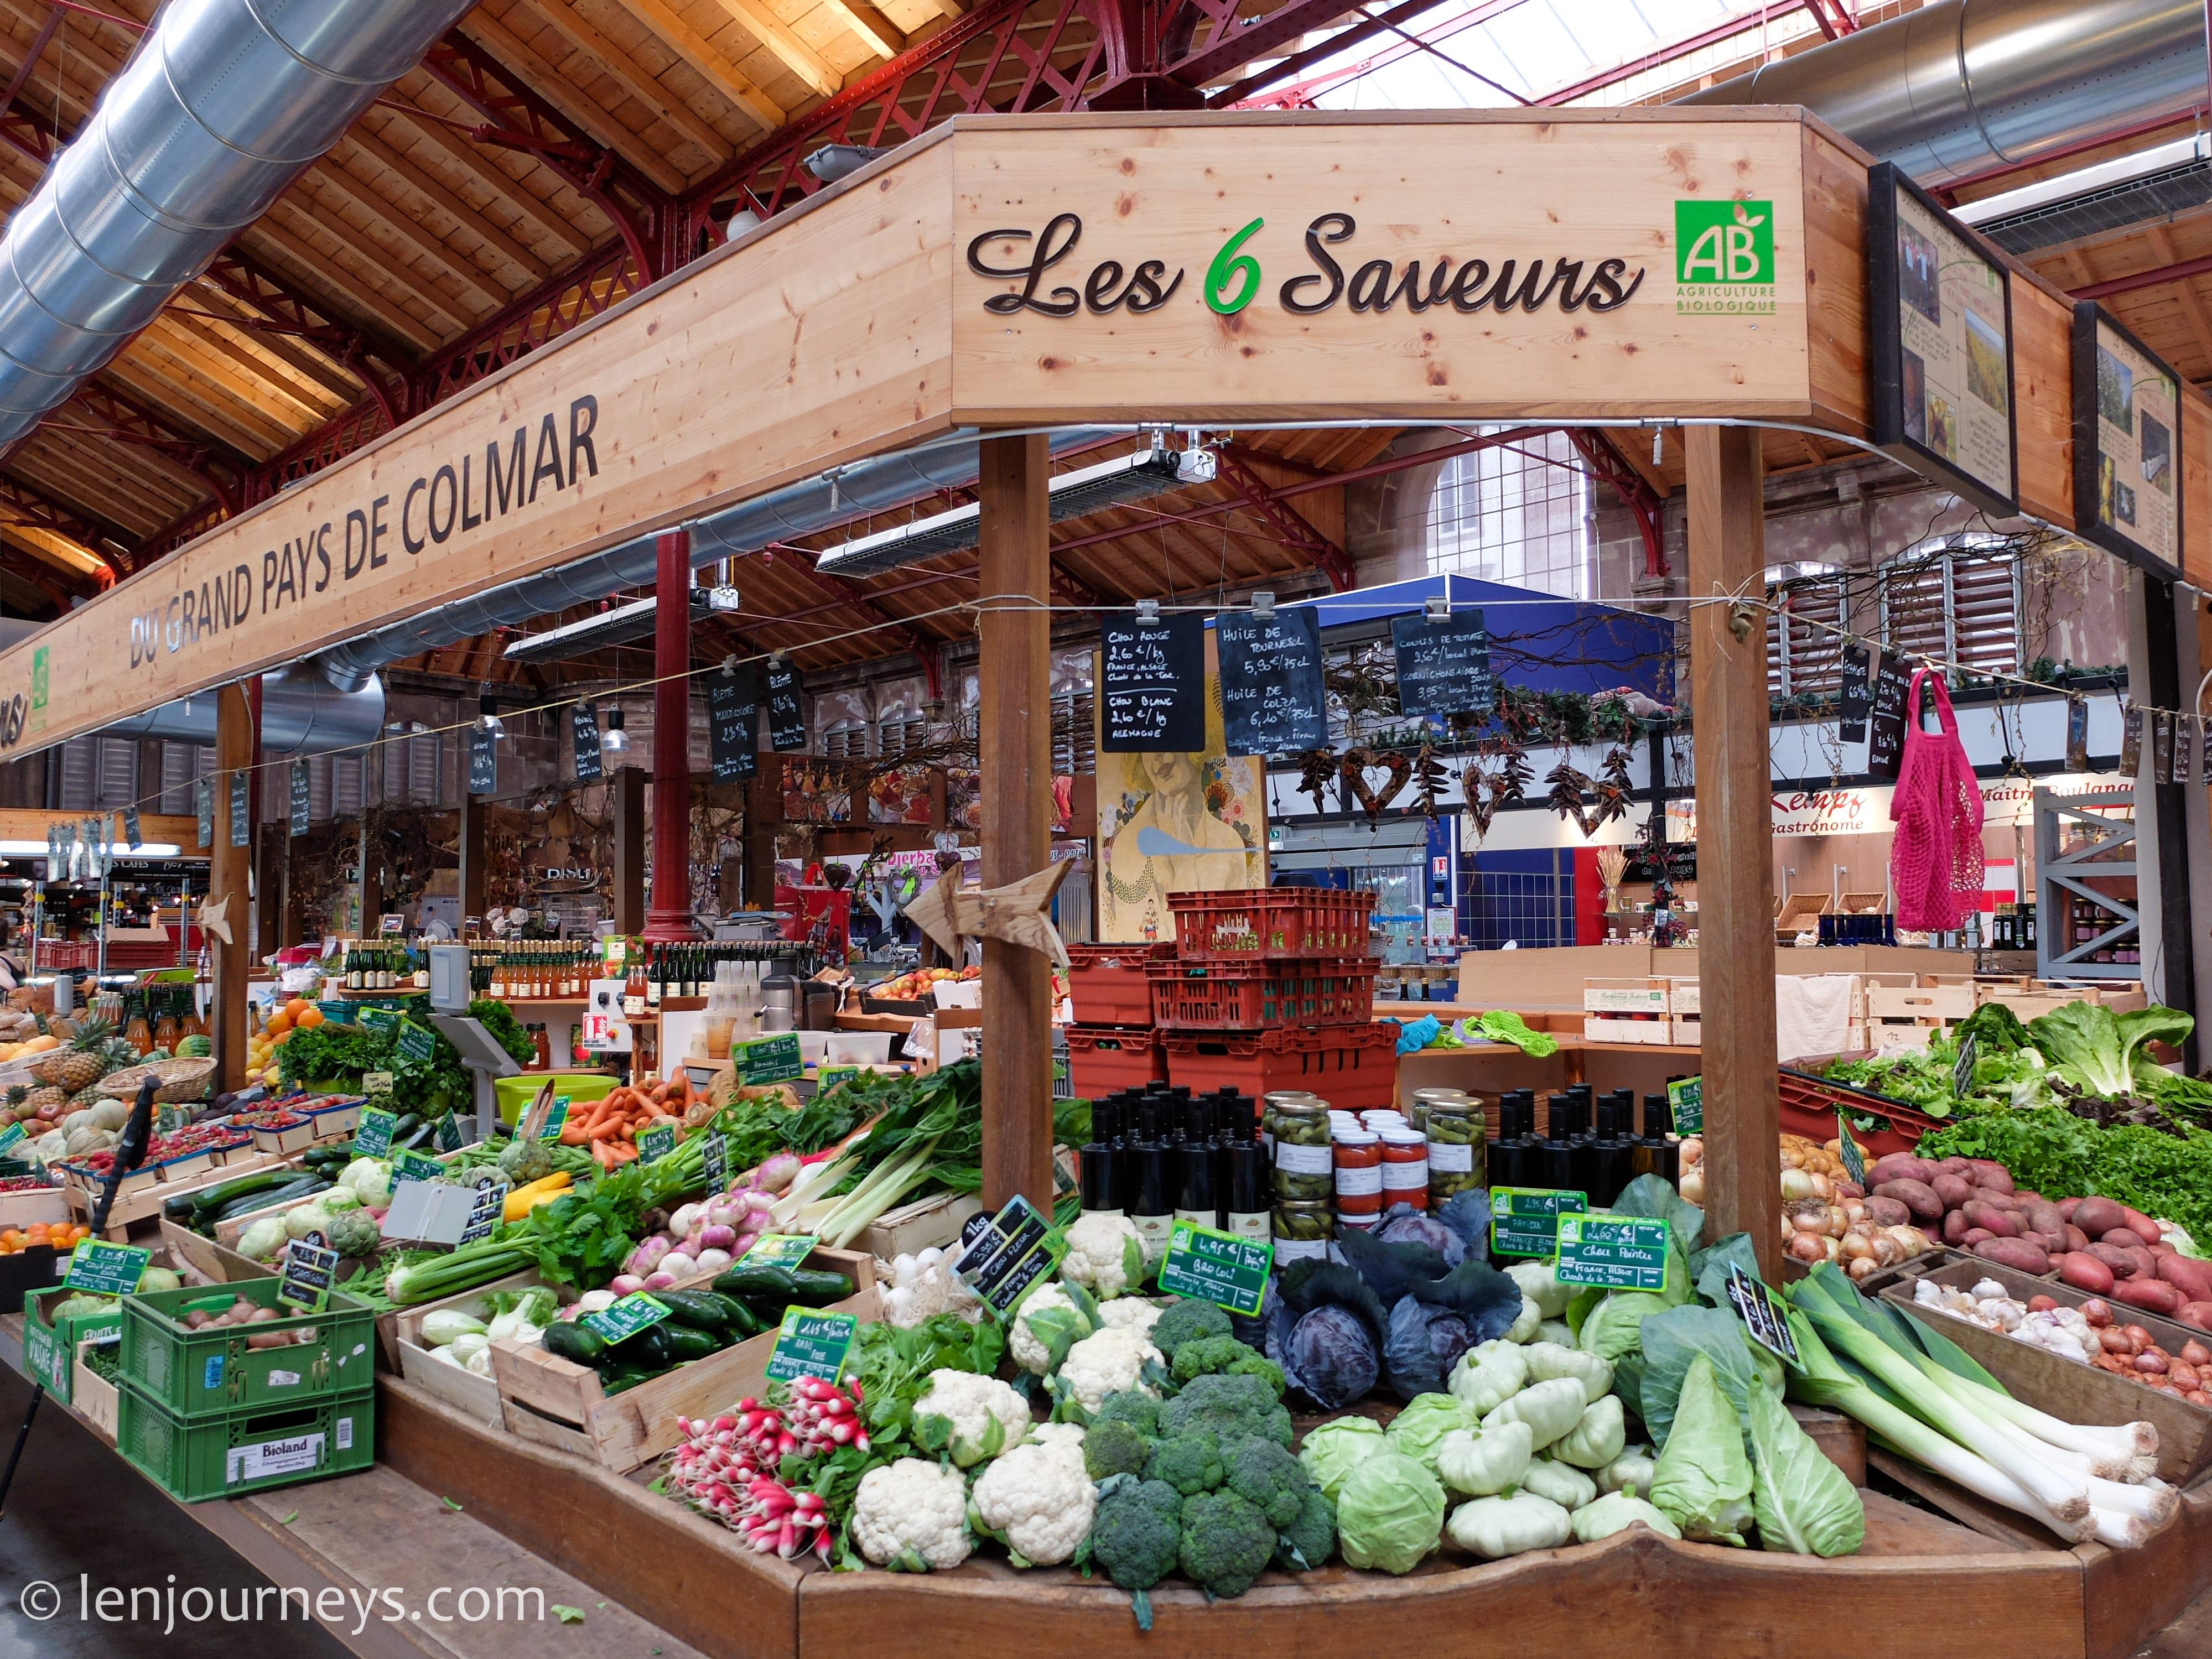 Market in Colmar